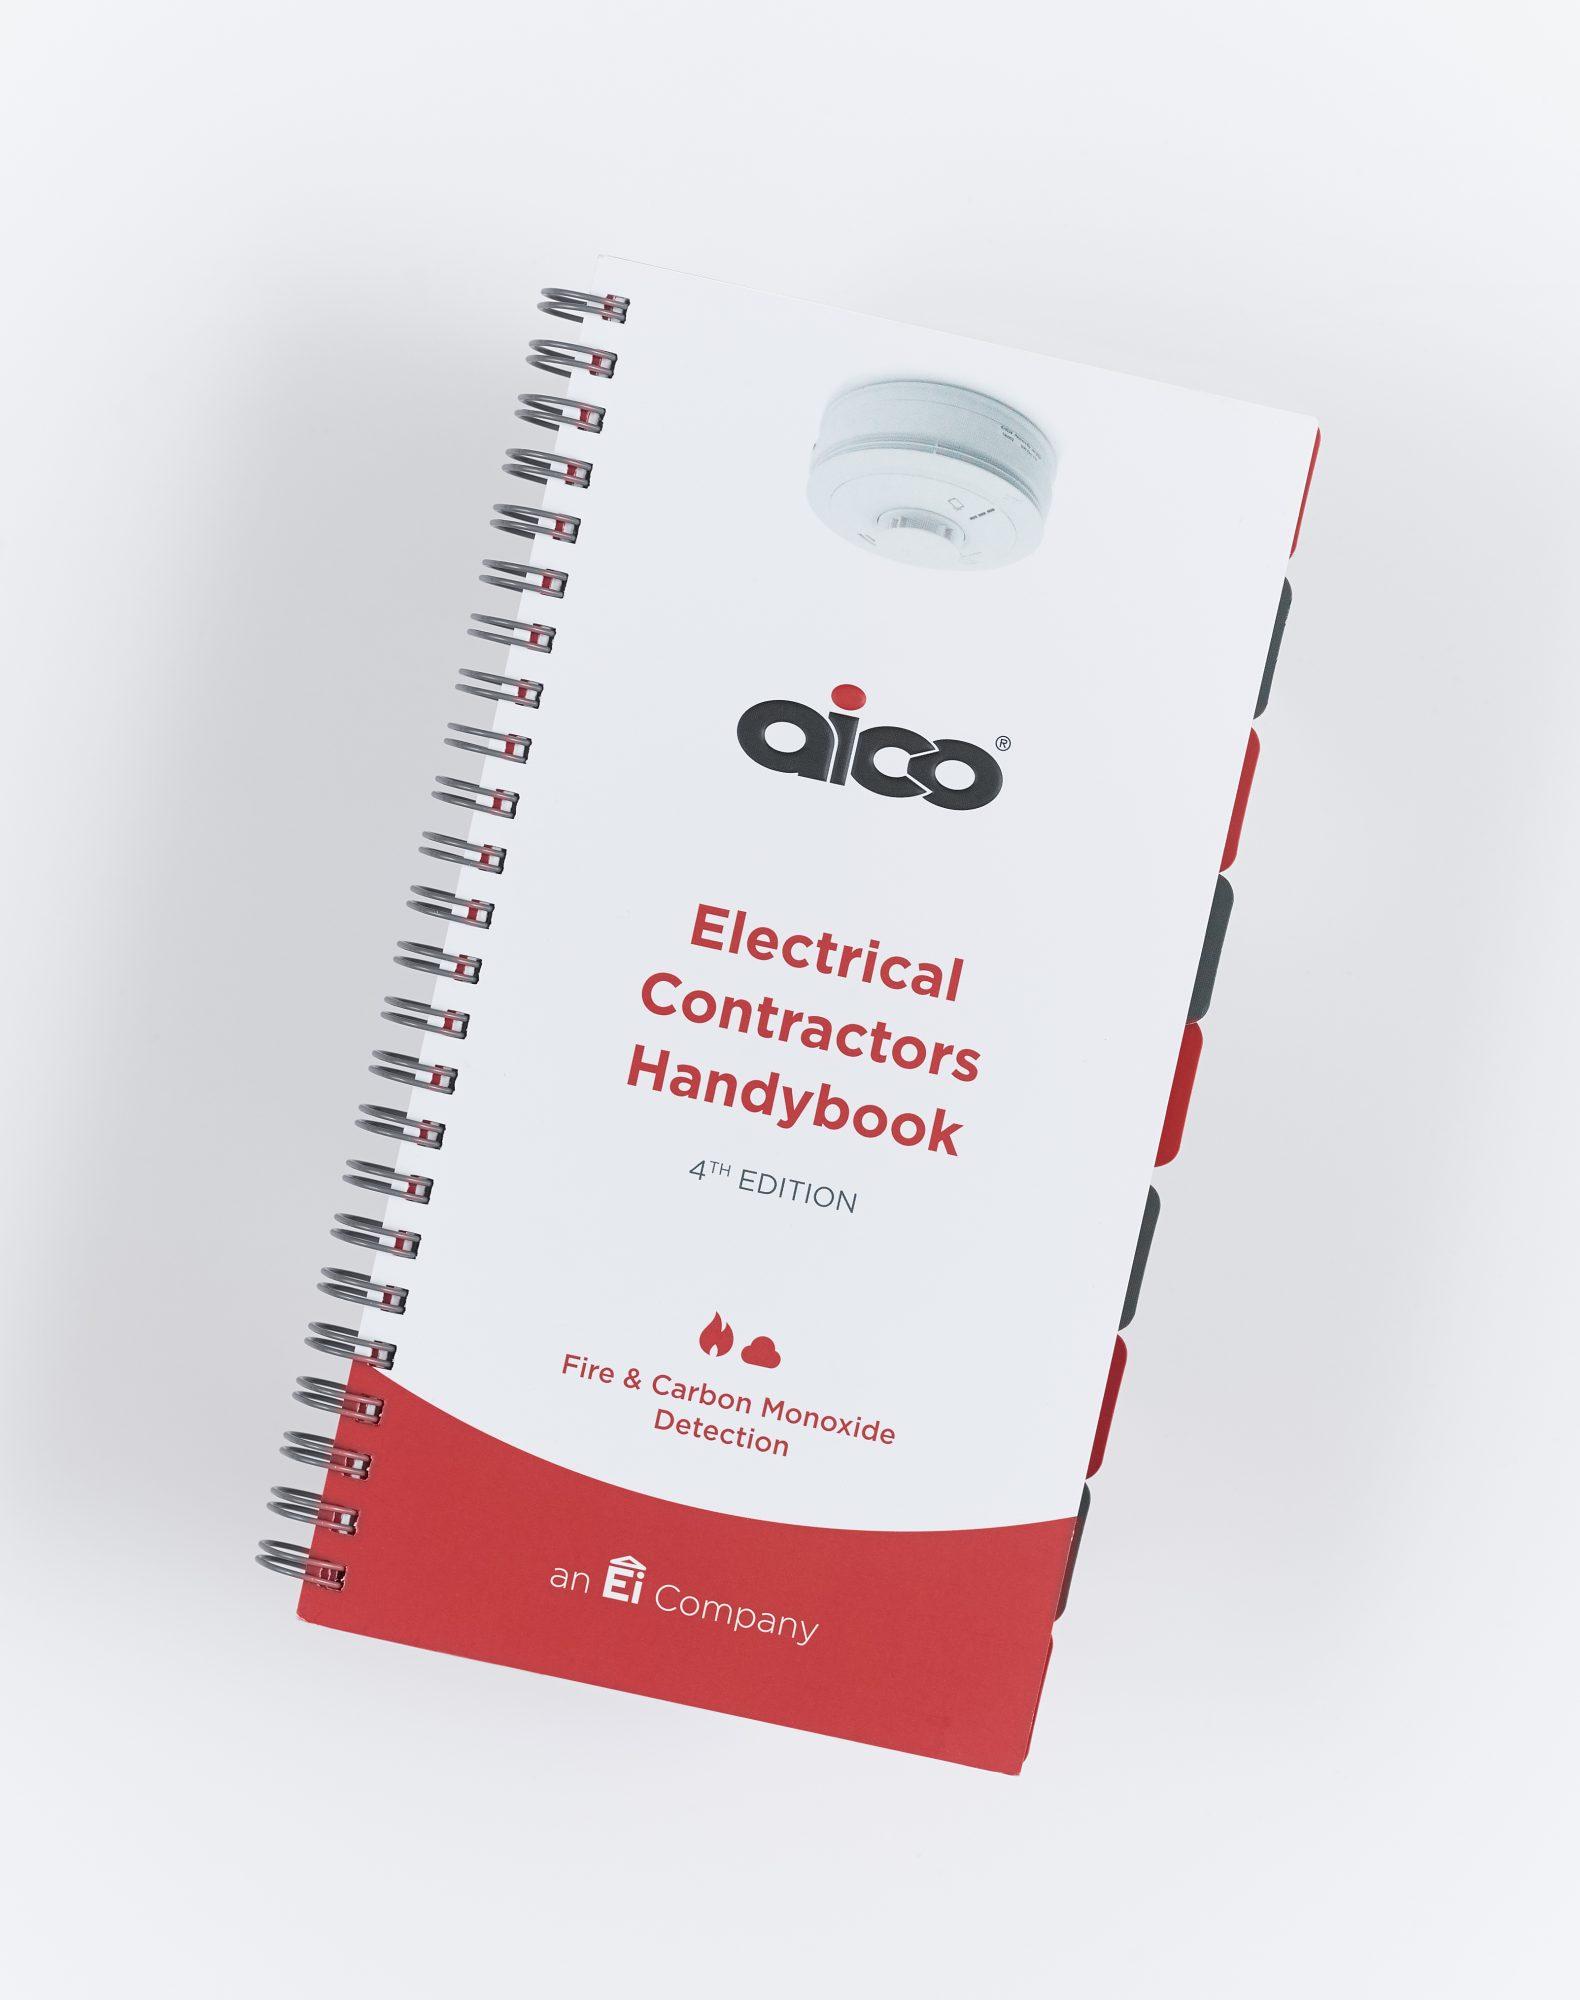 Aico's Electrical Contractors Handybook Gets New Look